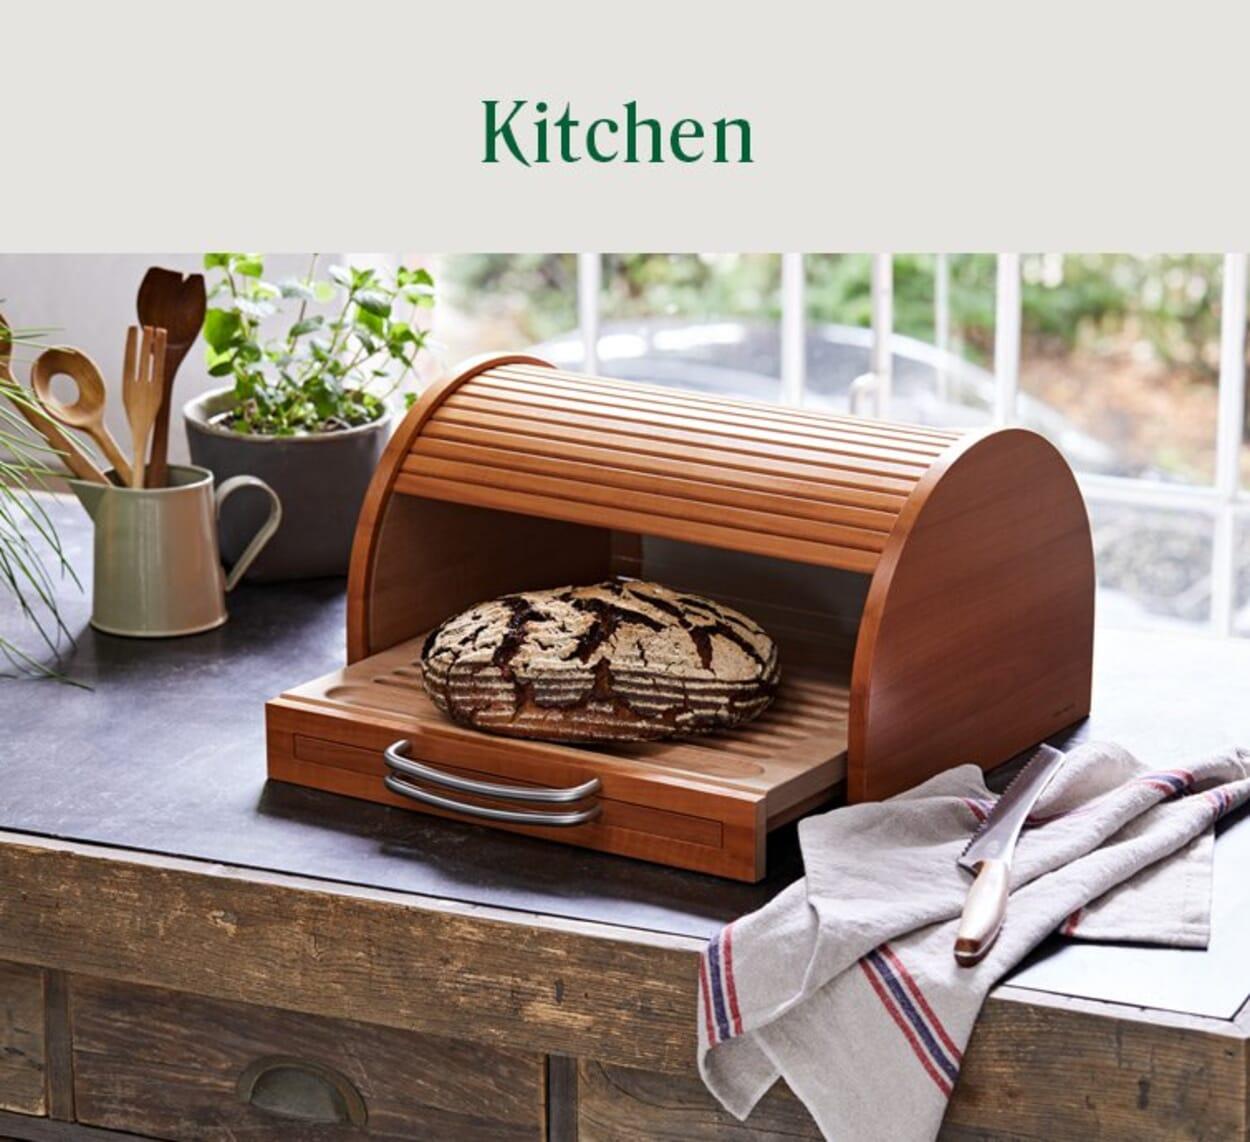 /kitchen-household-c193557/